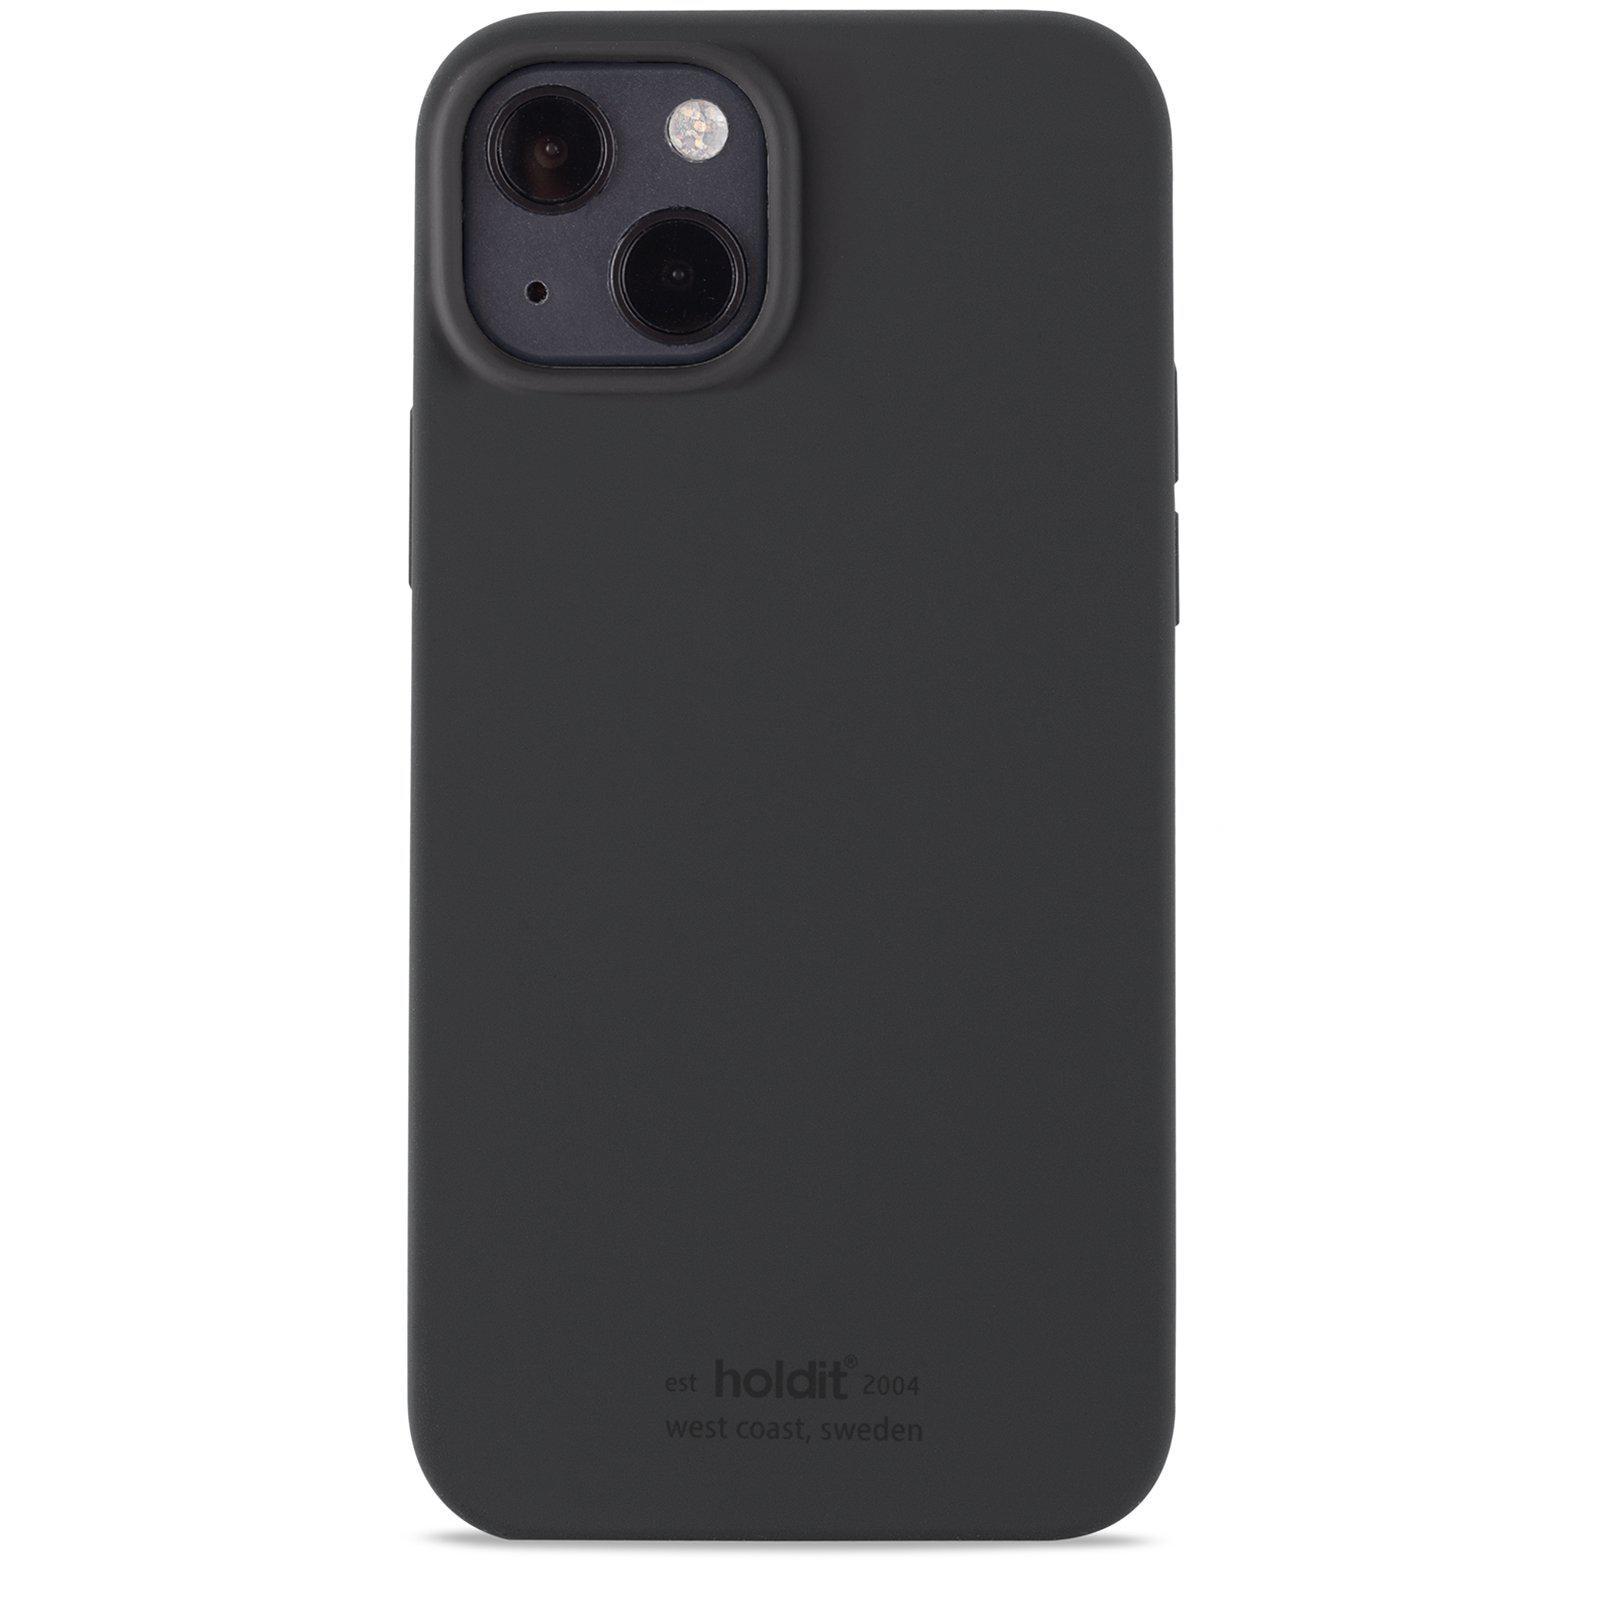 Silikonskal iPhone 13 Black